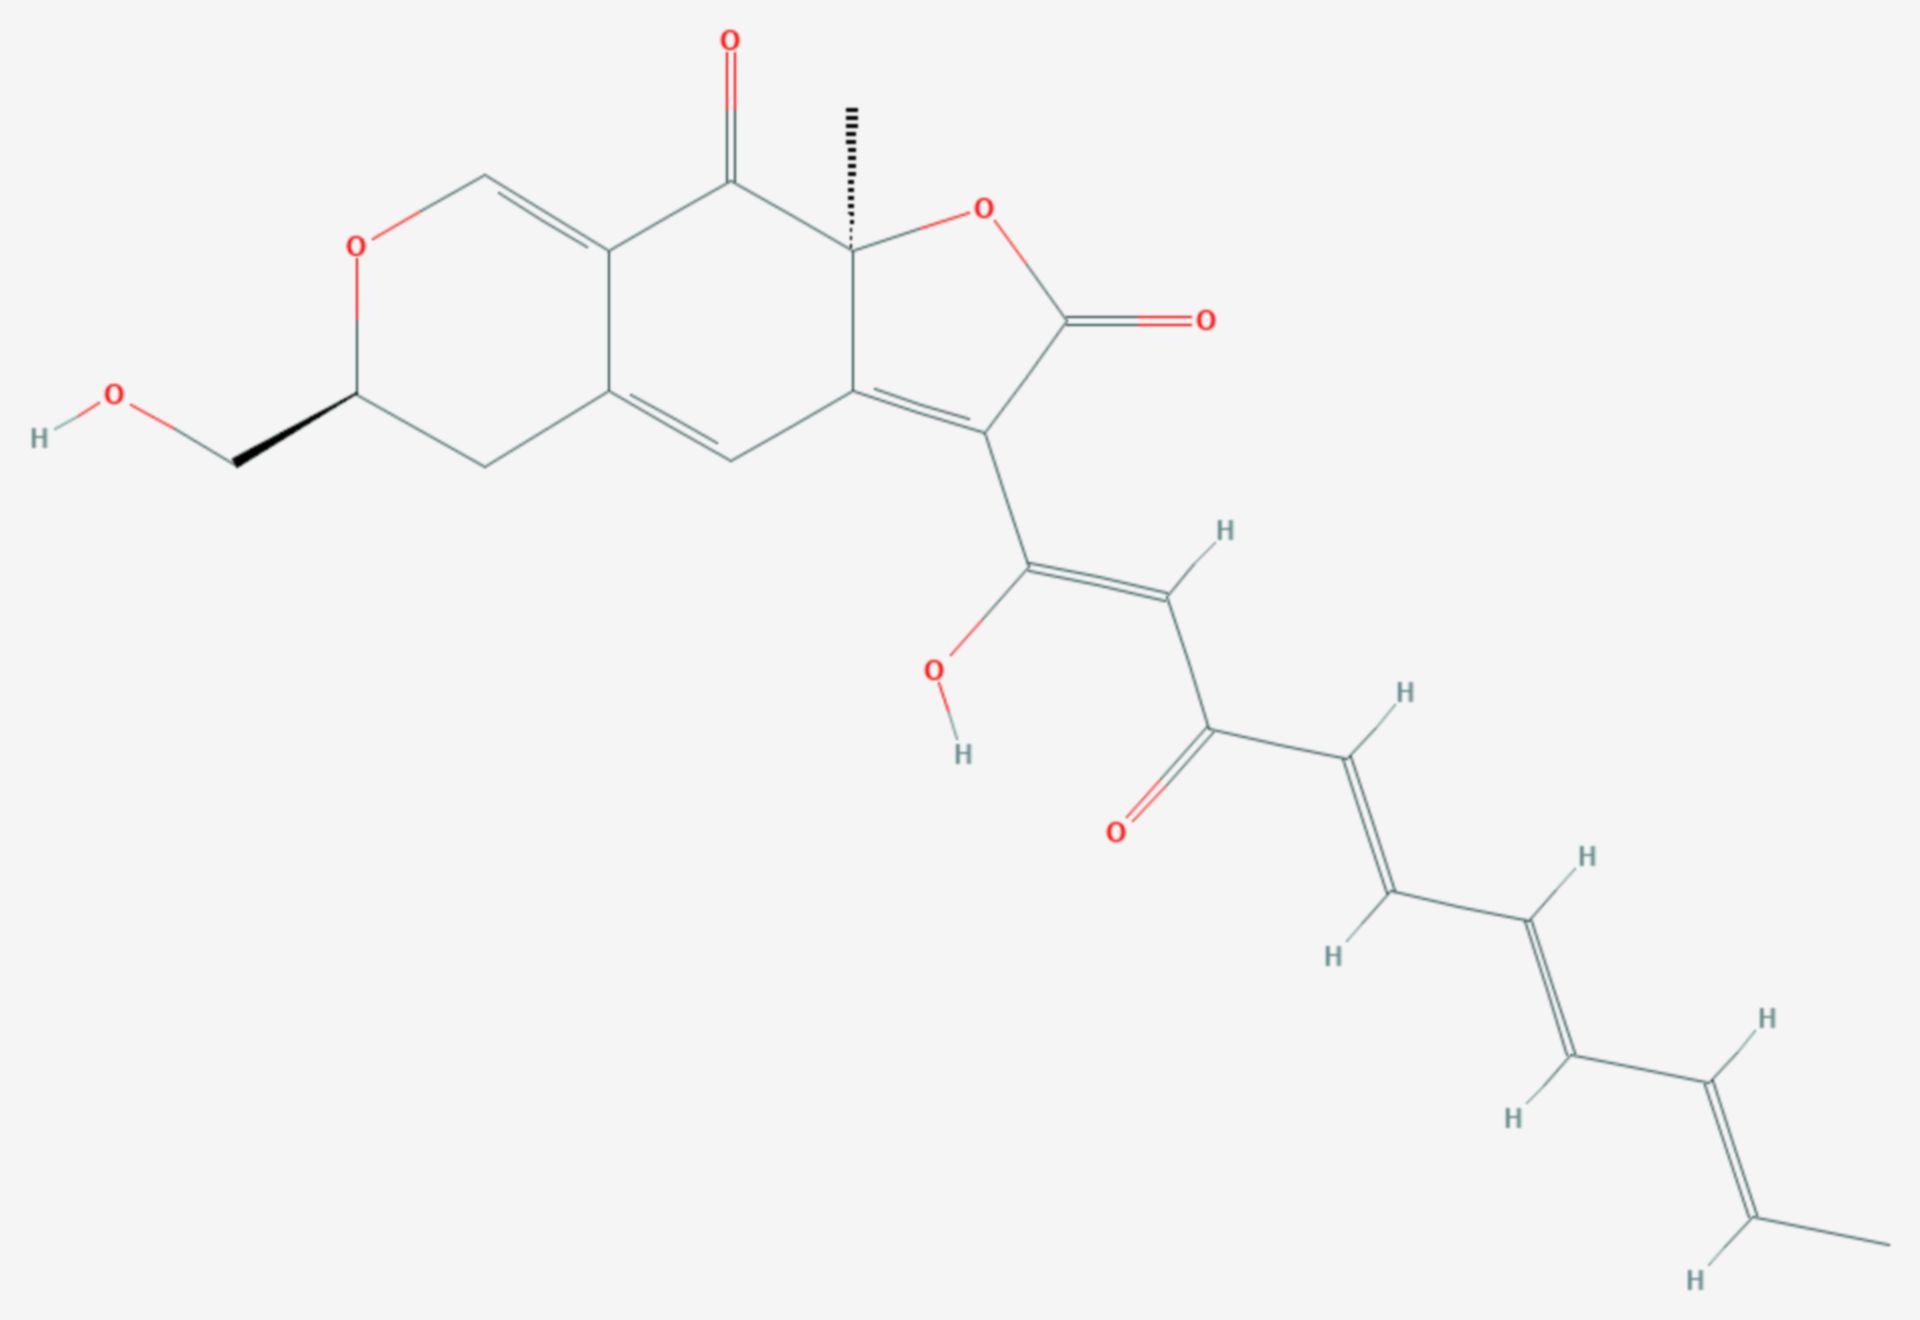 Epicocconon (Strukturformel)